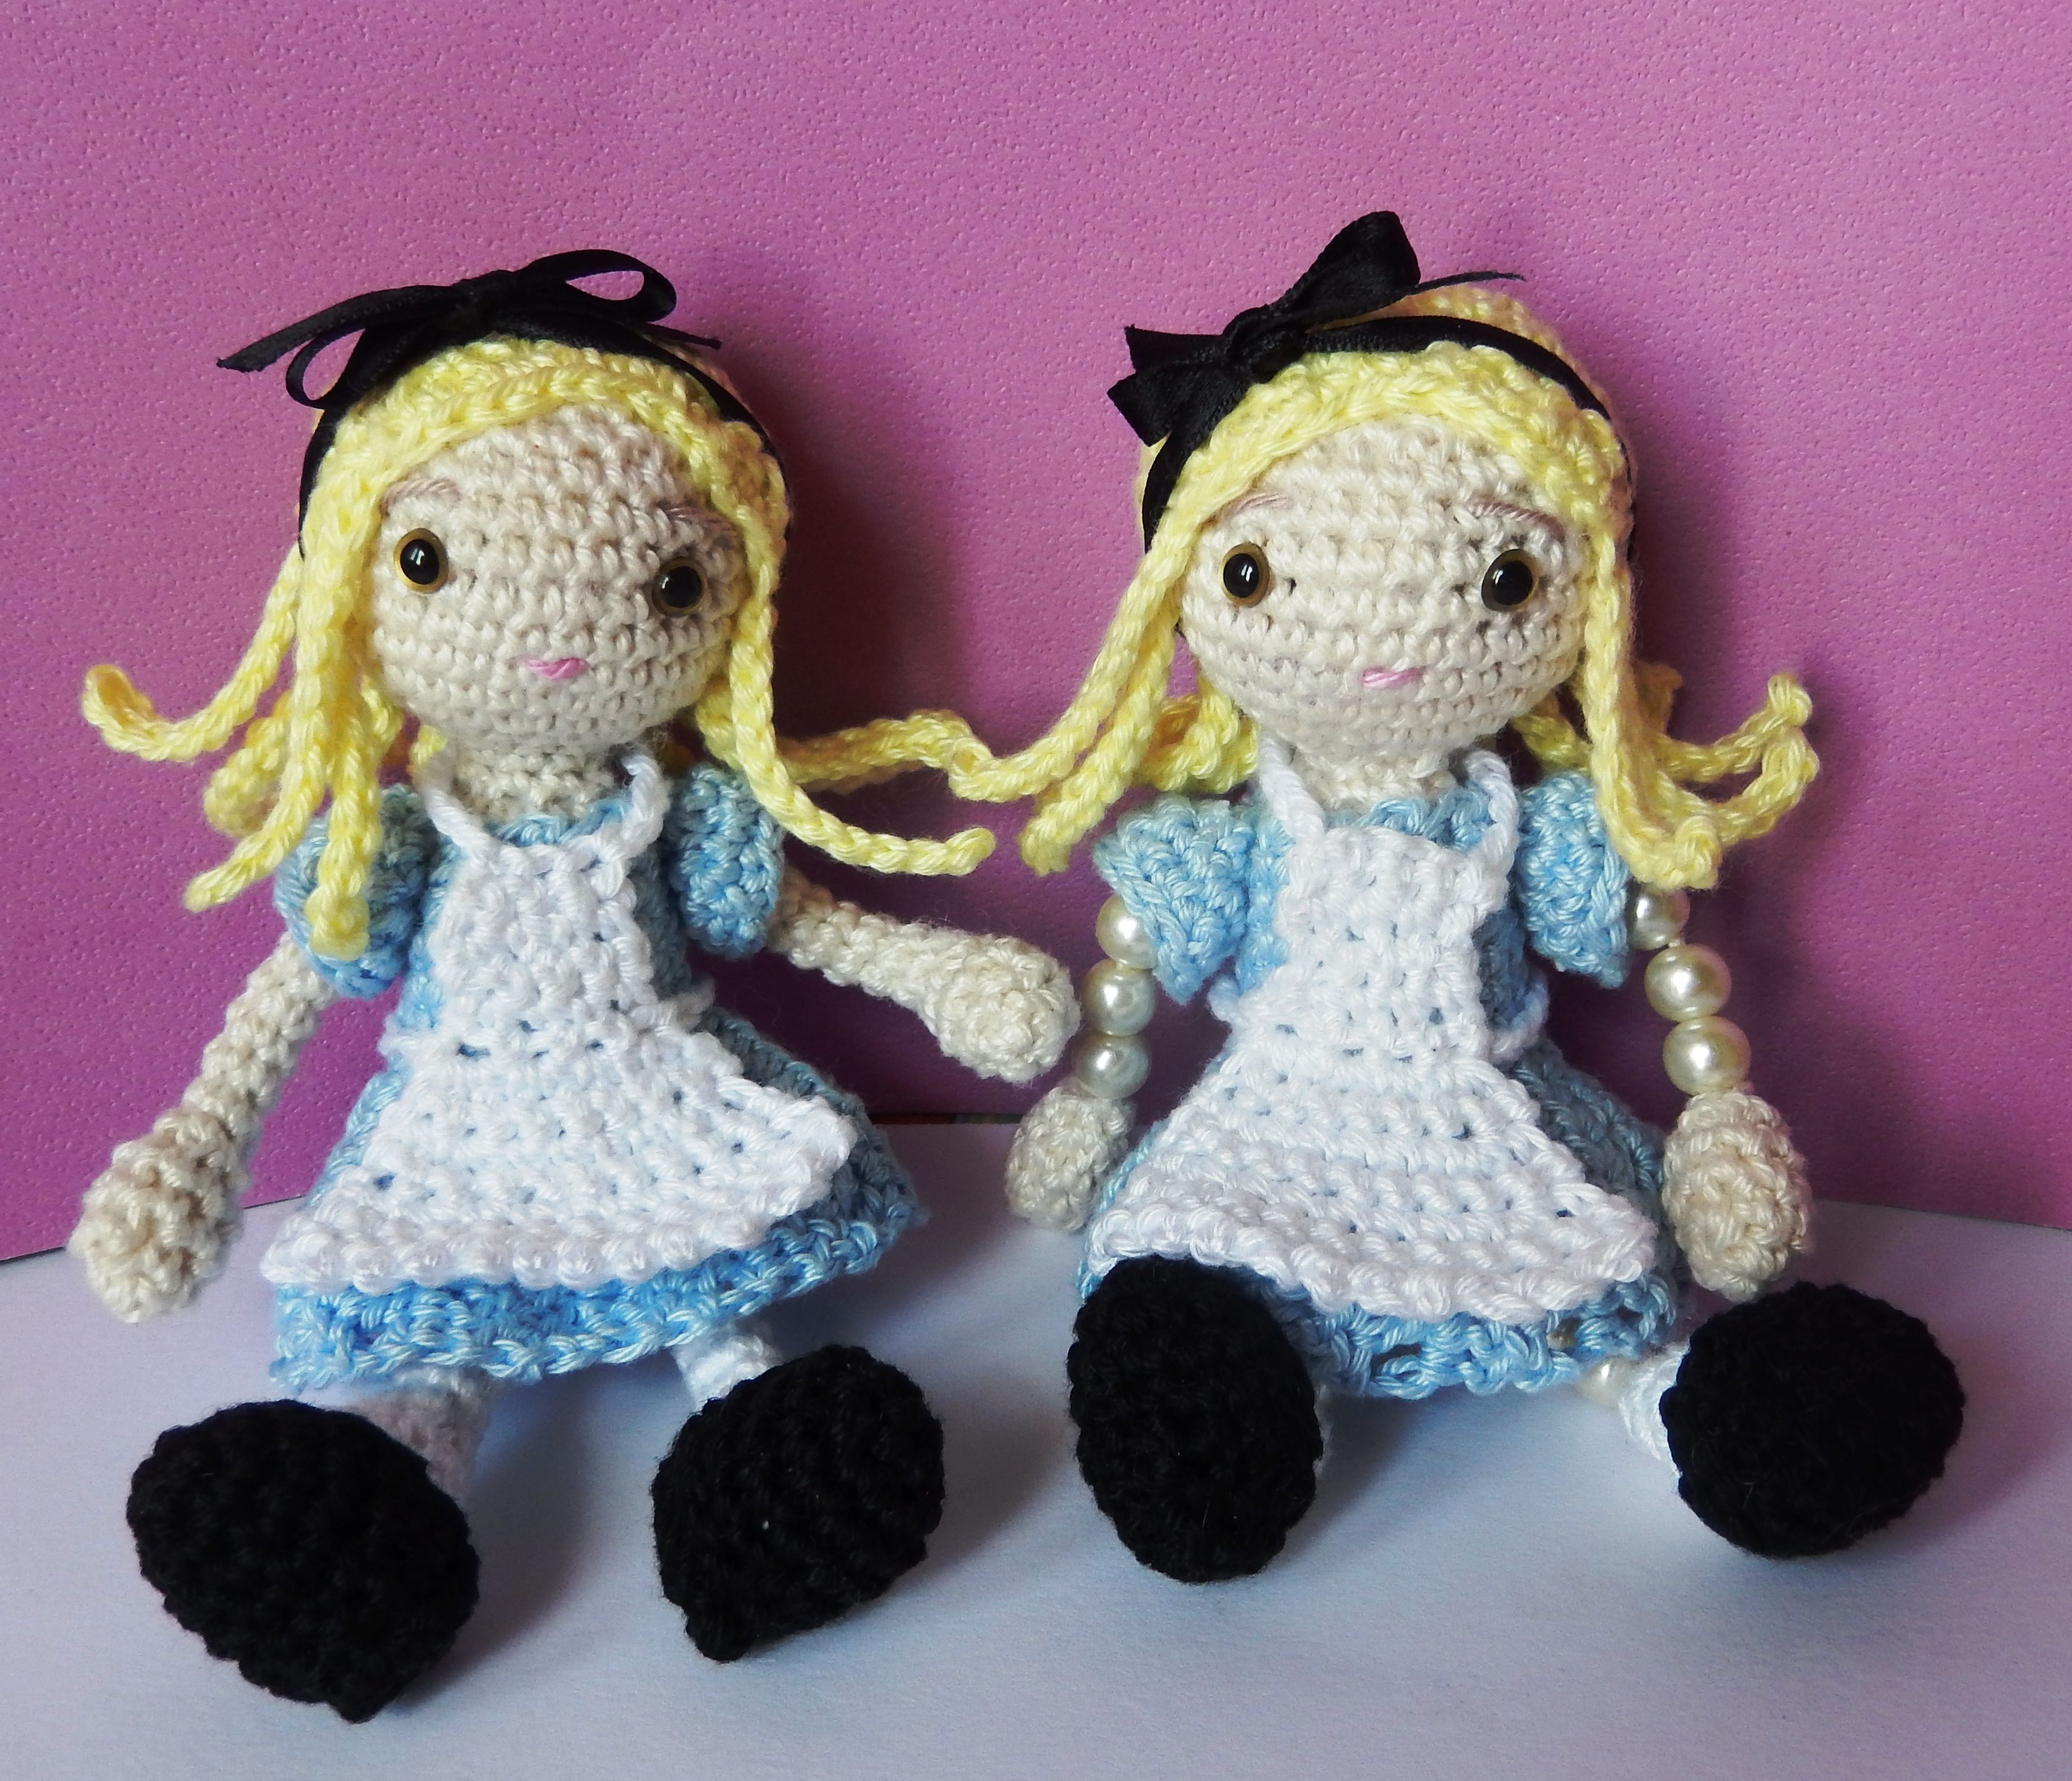 Read Mad Hatter Amigurumi Crochet Pattern Online by Sayjai | Books ... | 2882x3353